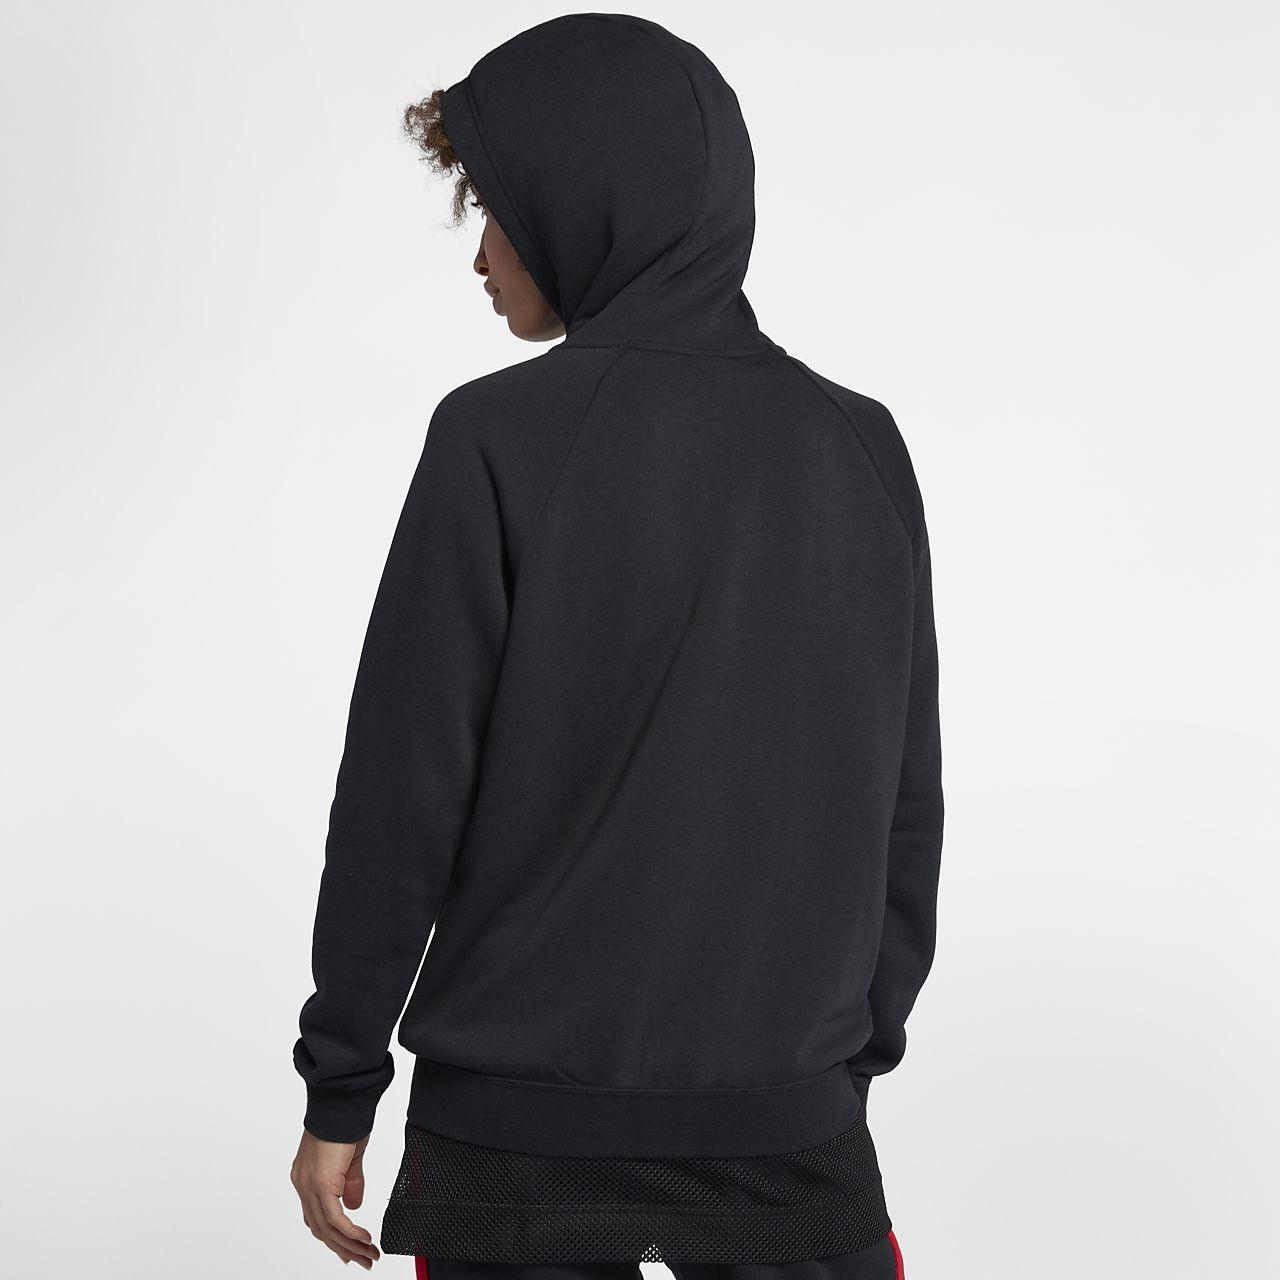 ba6550e77719 ... Sudadera con capucha de cierre completo para mujer Nike Sportswear Rally